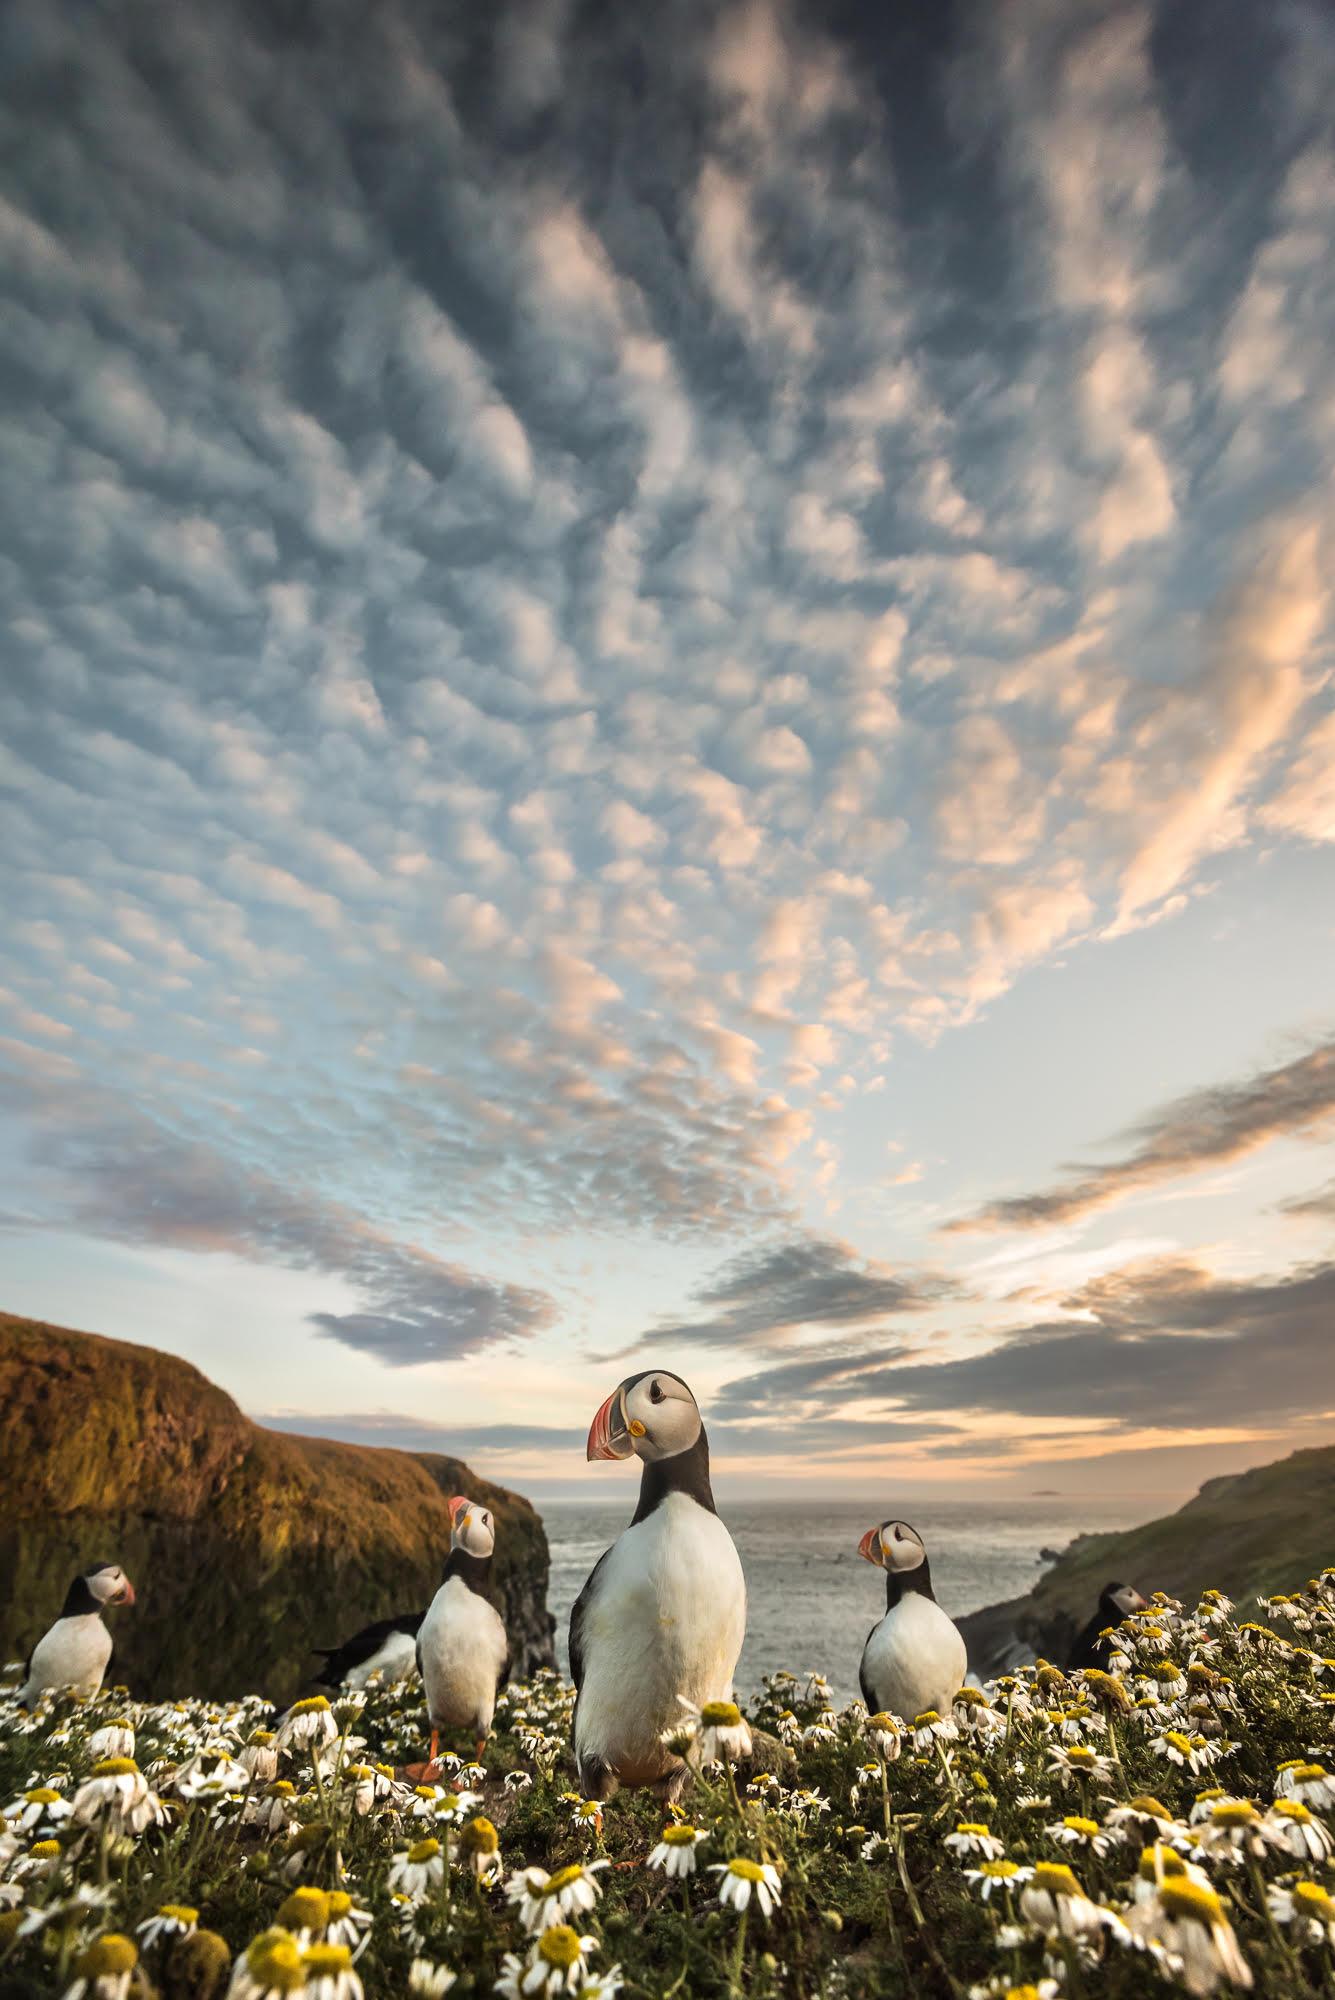 Landscape image featuring Skomer puffins